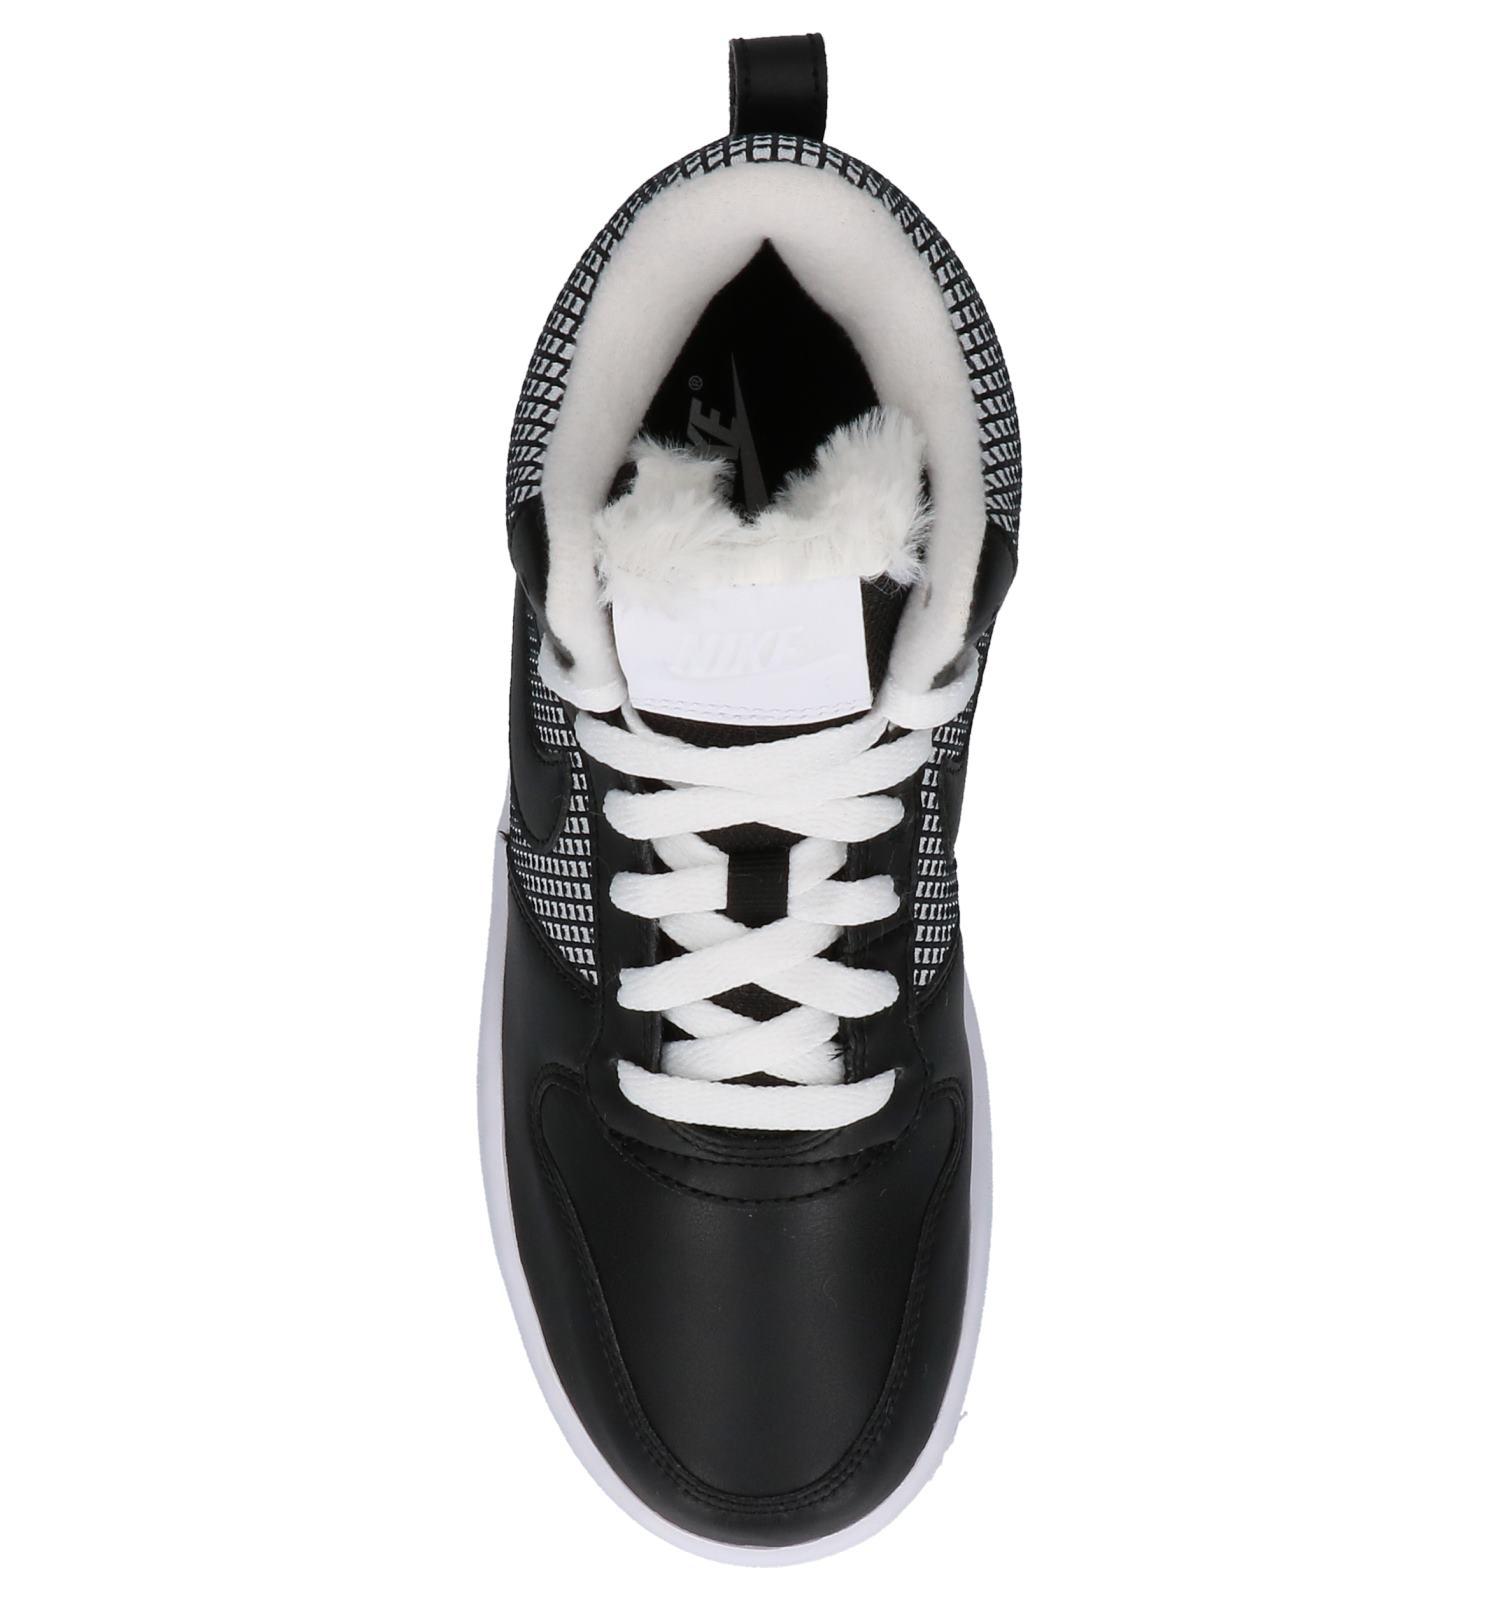 0bbec7f9b5a Hoge Sneakers Nike Court Borough Zwart met Wit | TORFS.BE | Gratis verzend  en retour